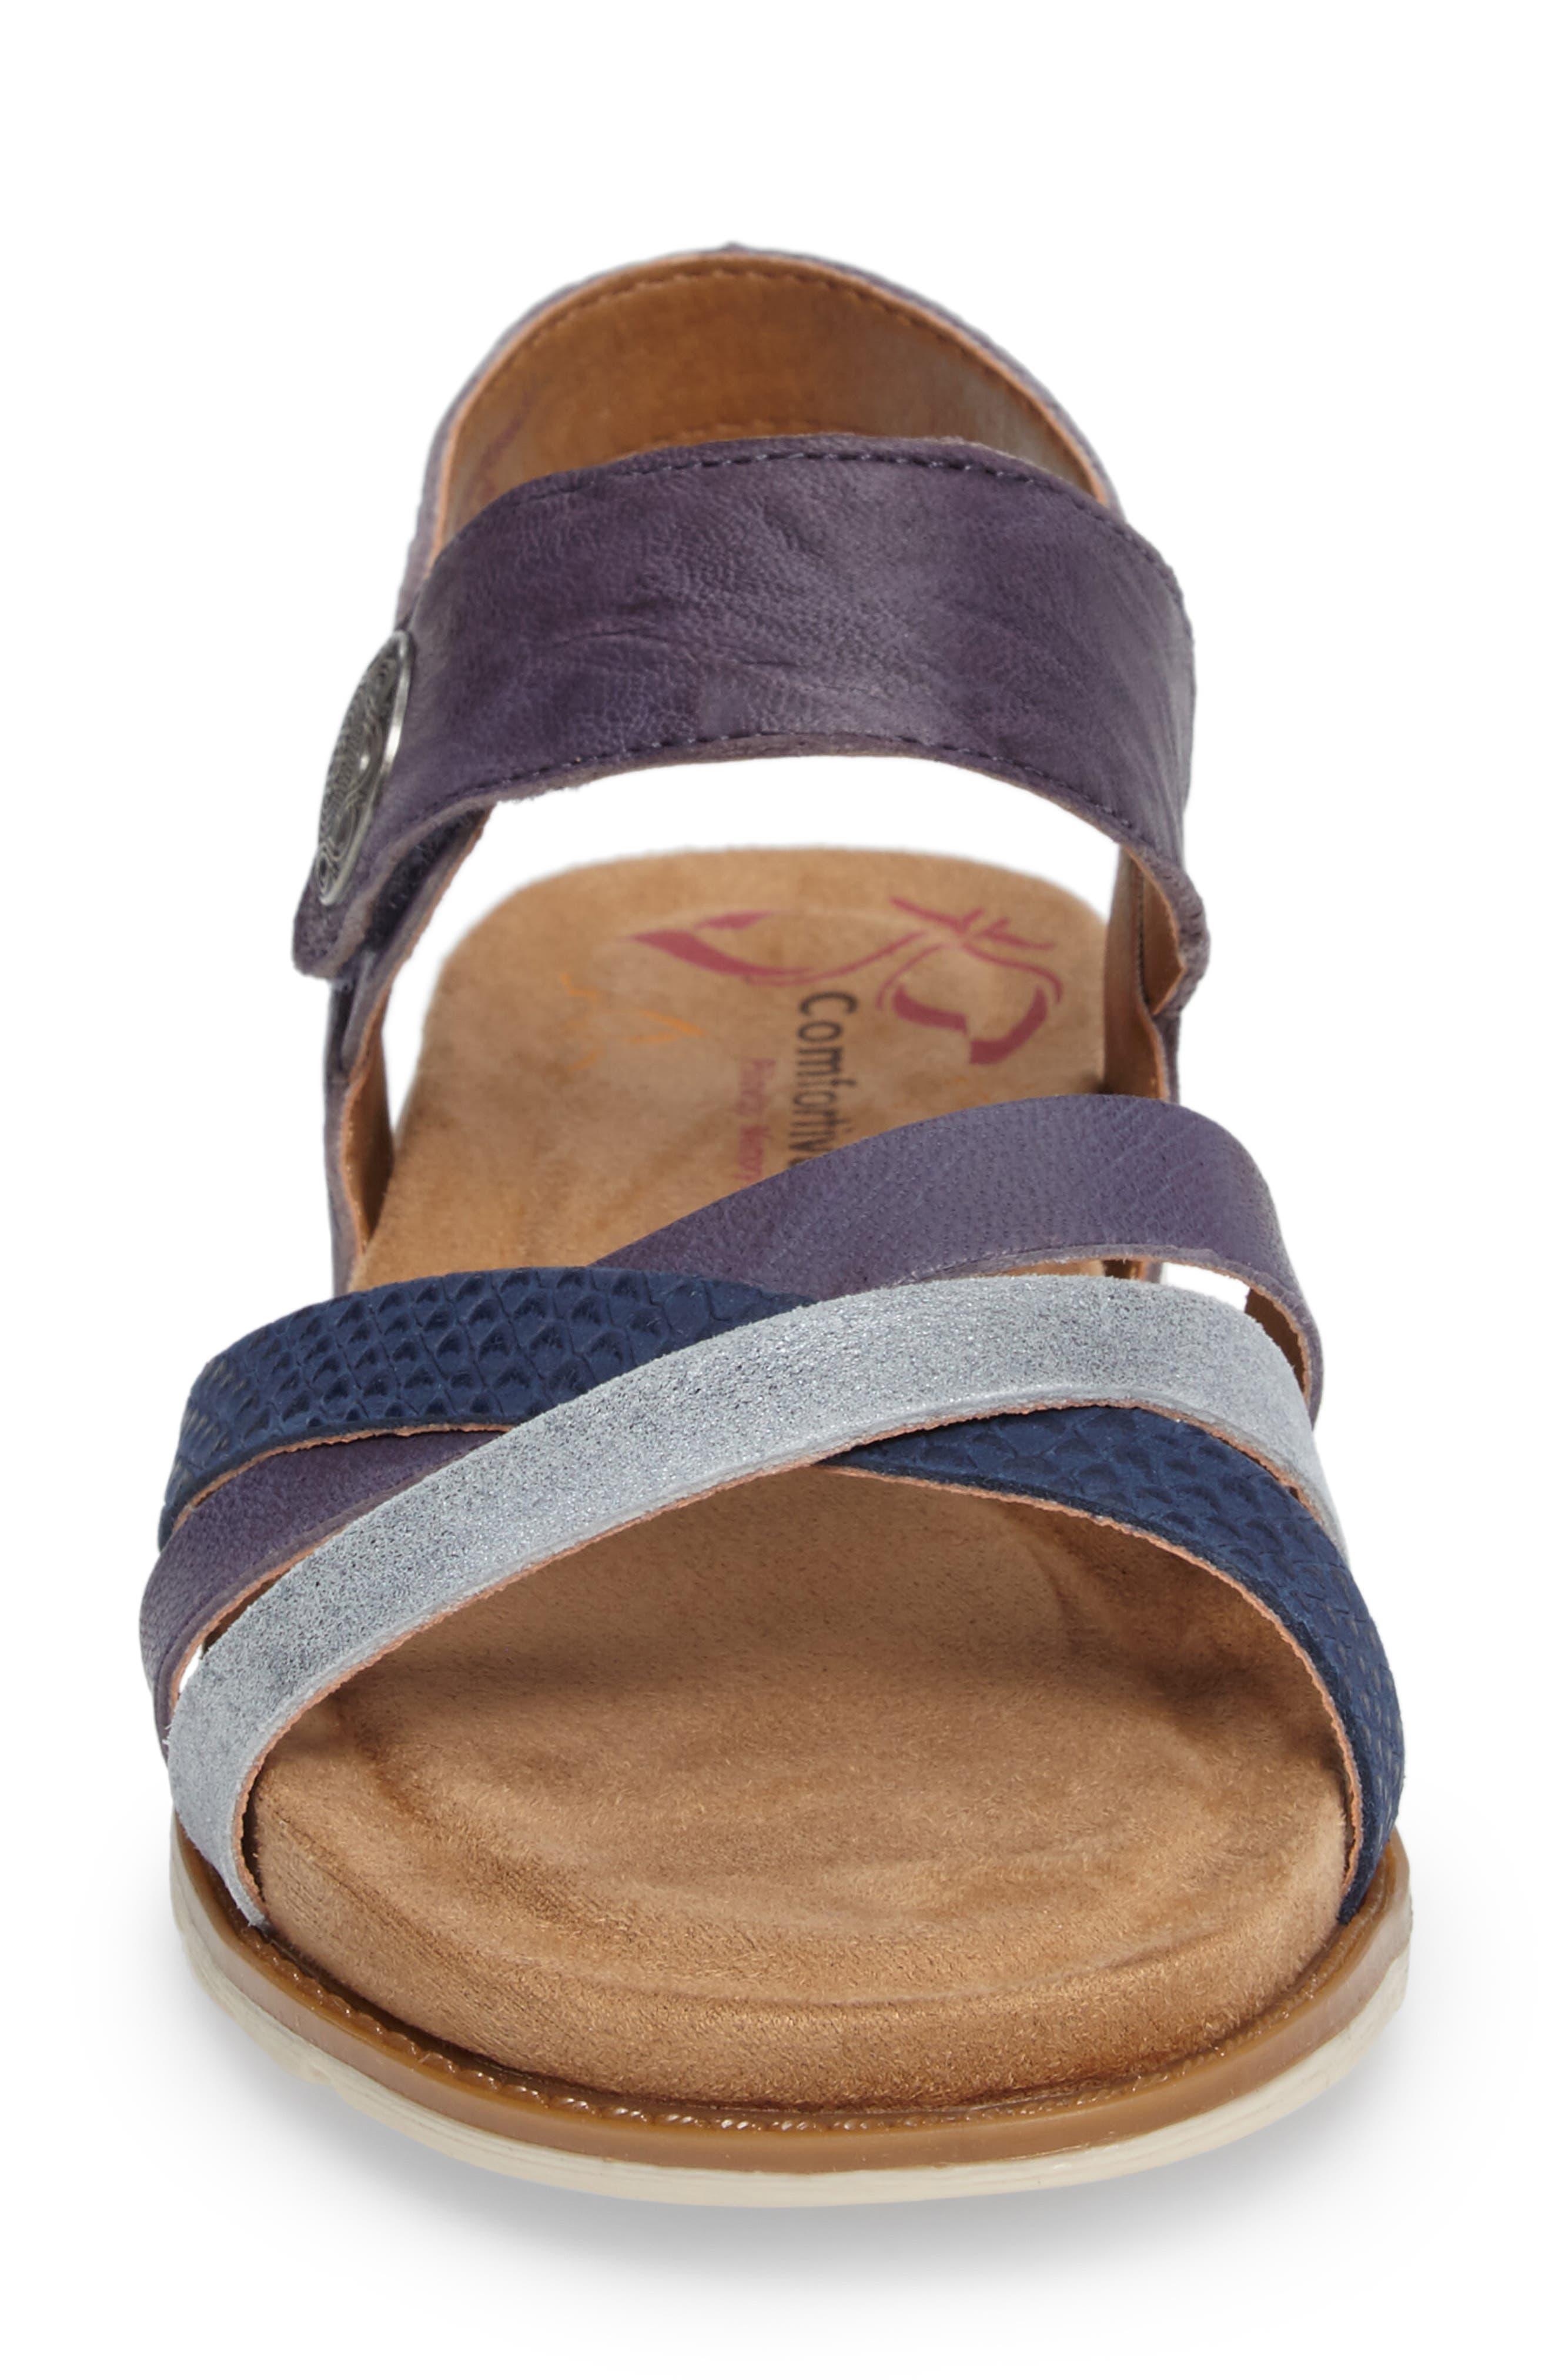 Alonsa Sandal,                             Alternate thumbnail 4, color,                             Denim Leather